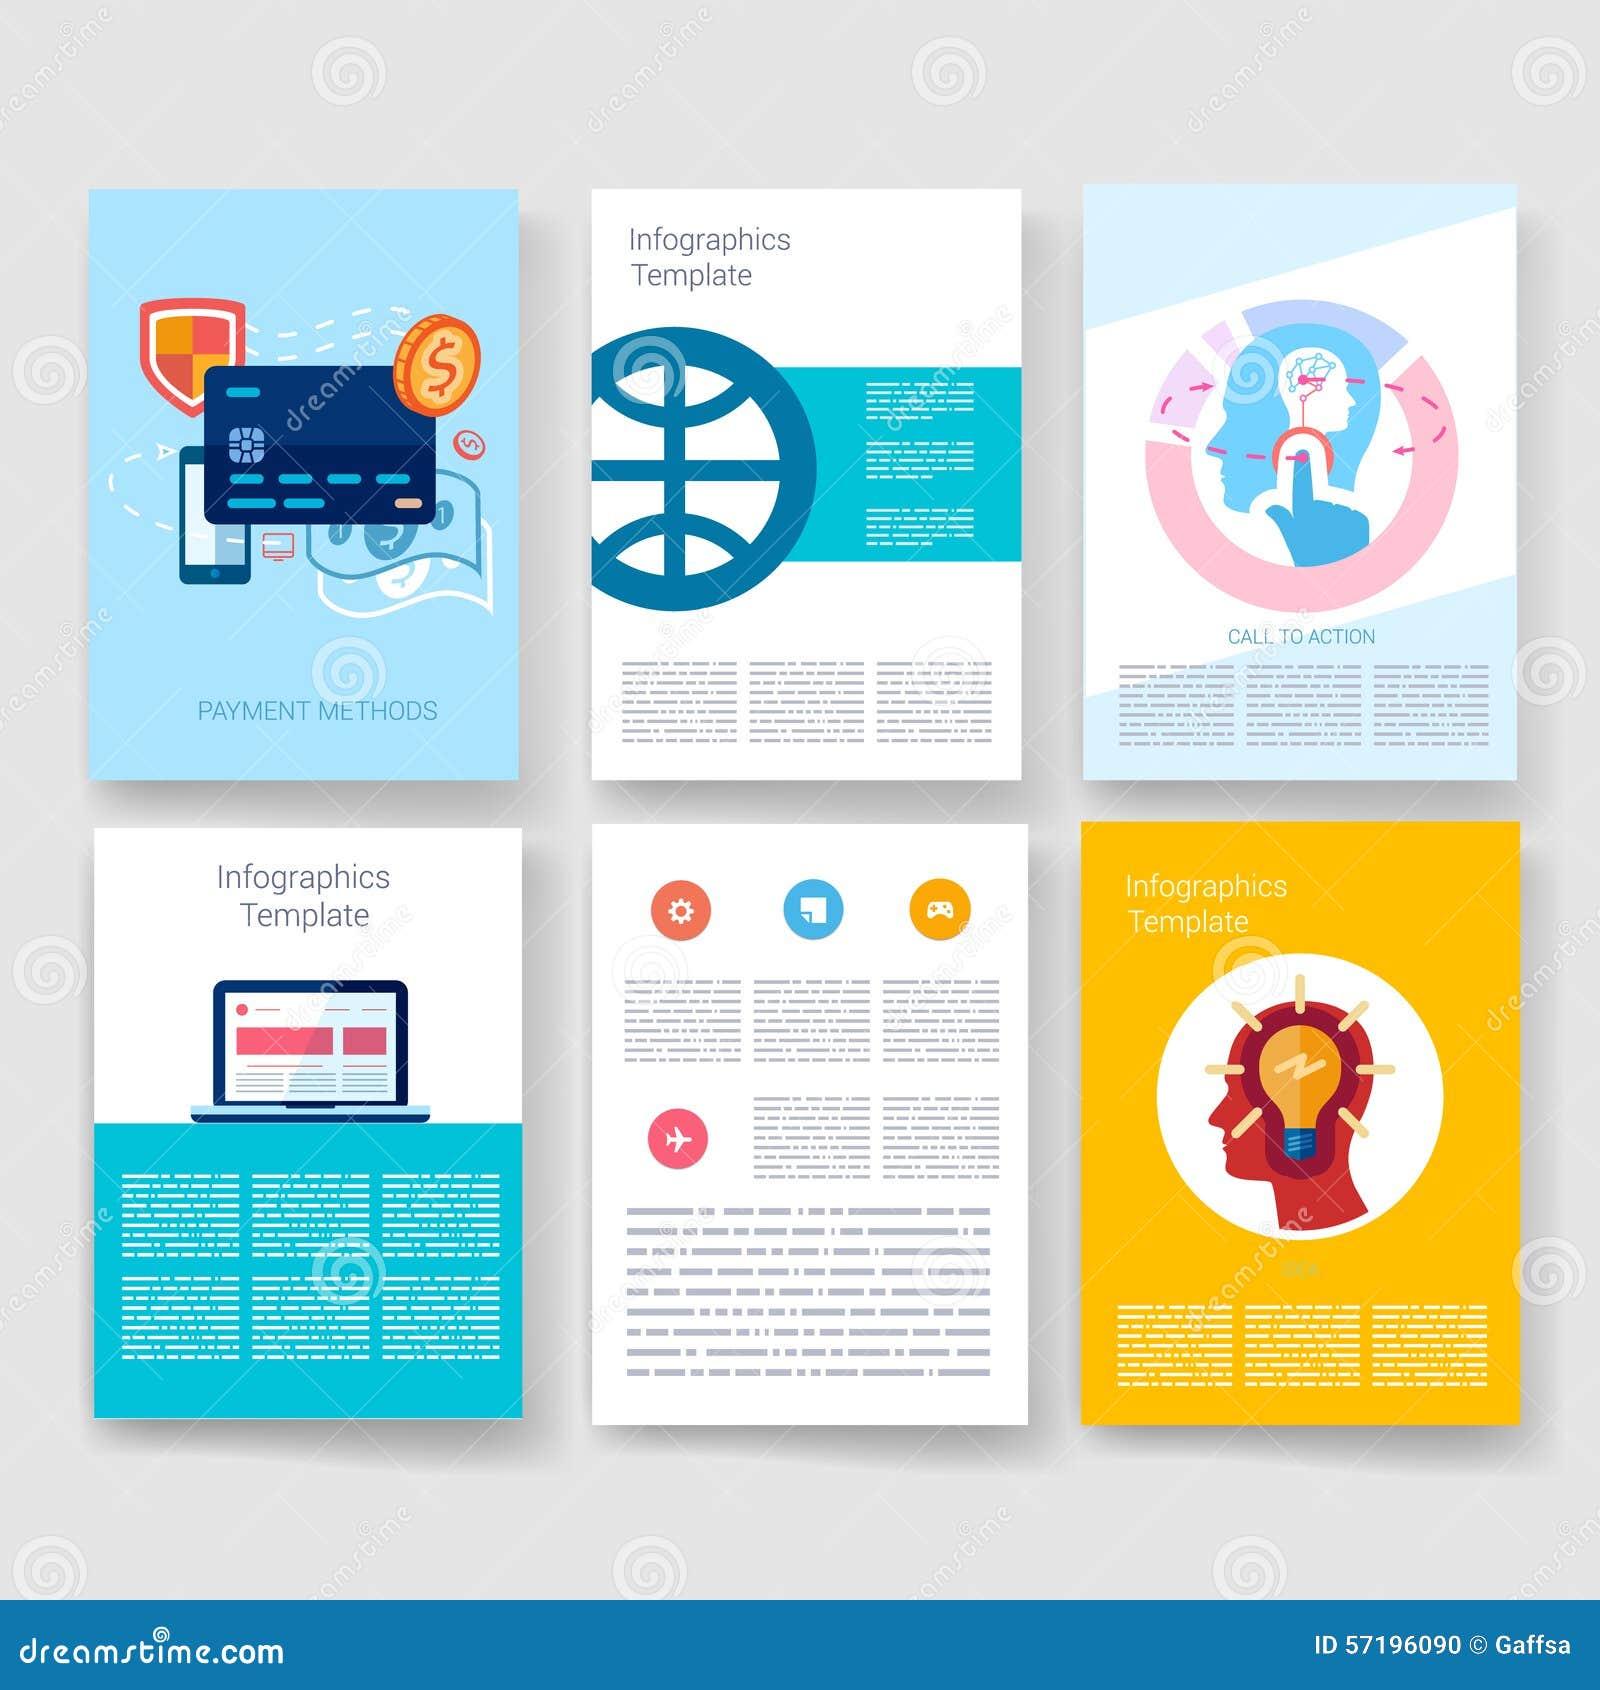 Templates Design Set Of Web Mail Brochures Stock Vector